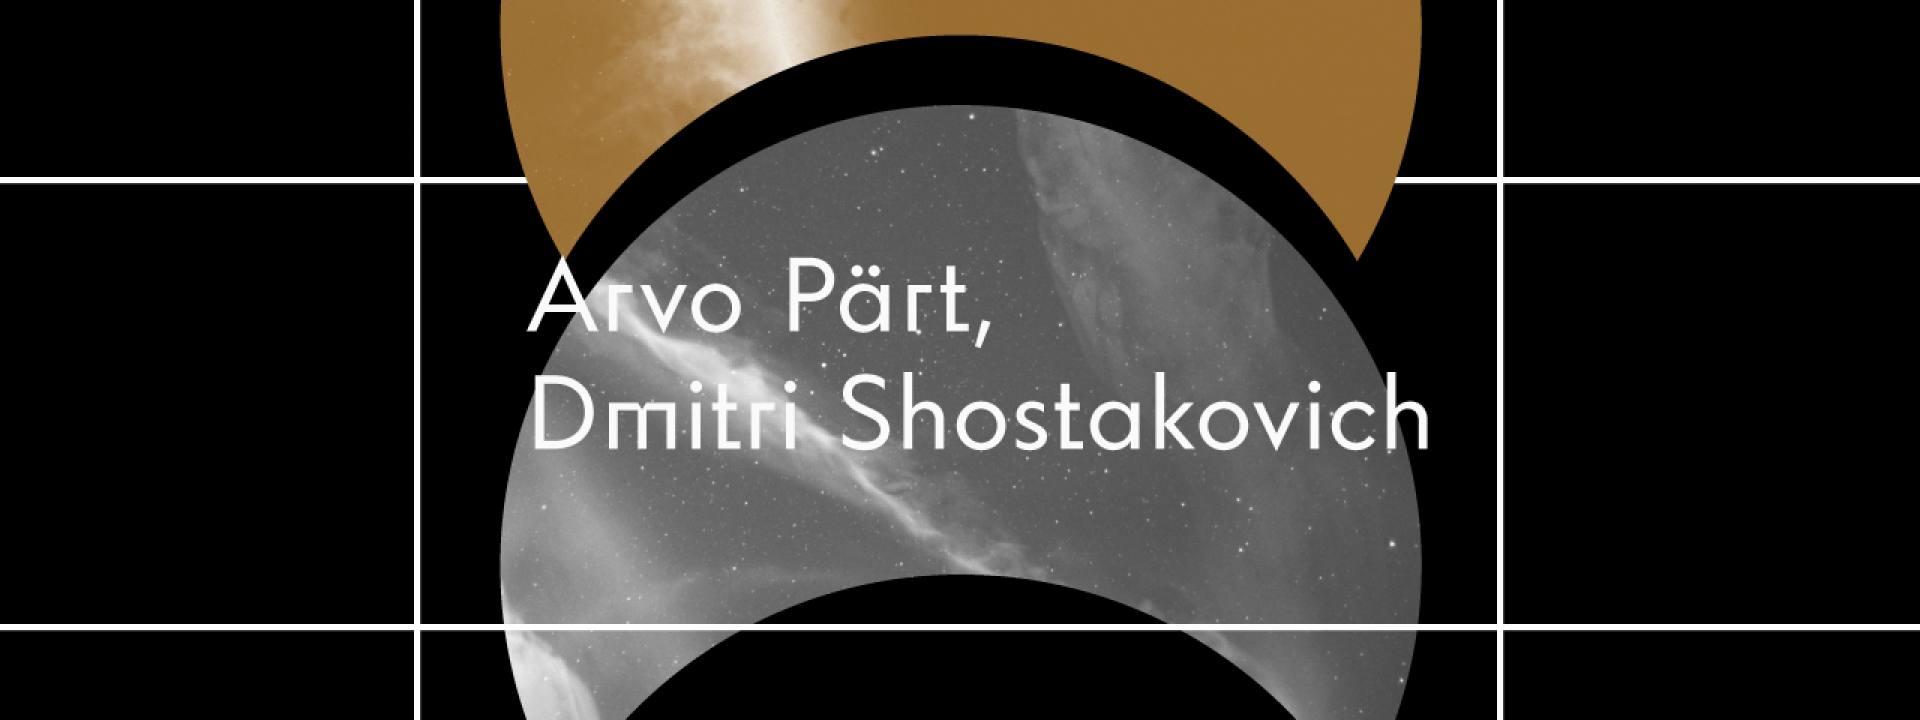 Cosmos: Camerata - The Friends of Music Orchestra | In Memoriam Benjamin Britten - Εικόνα